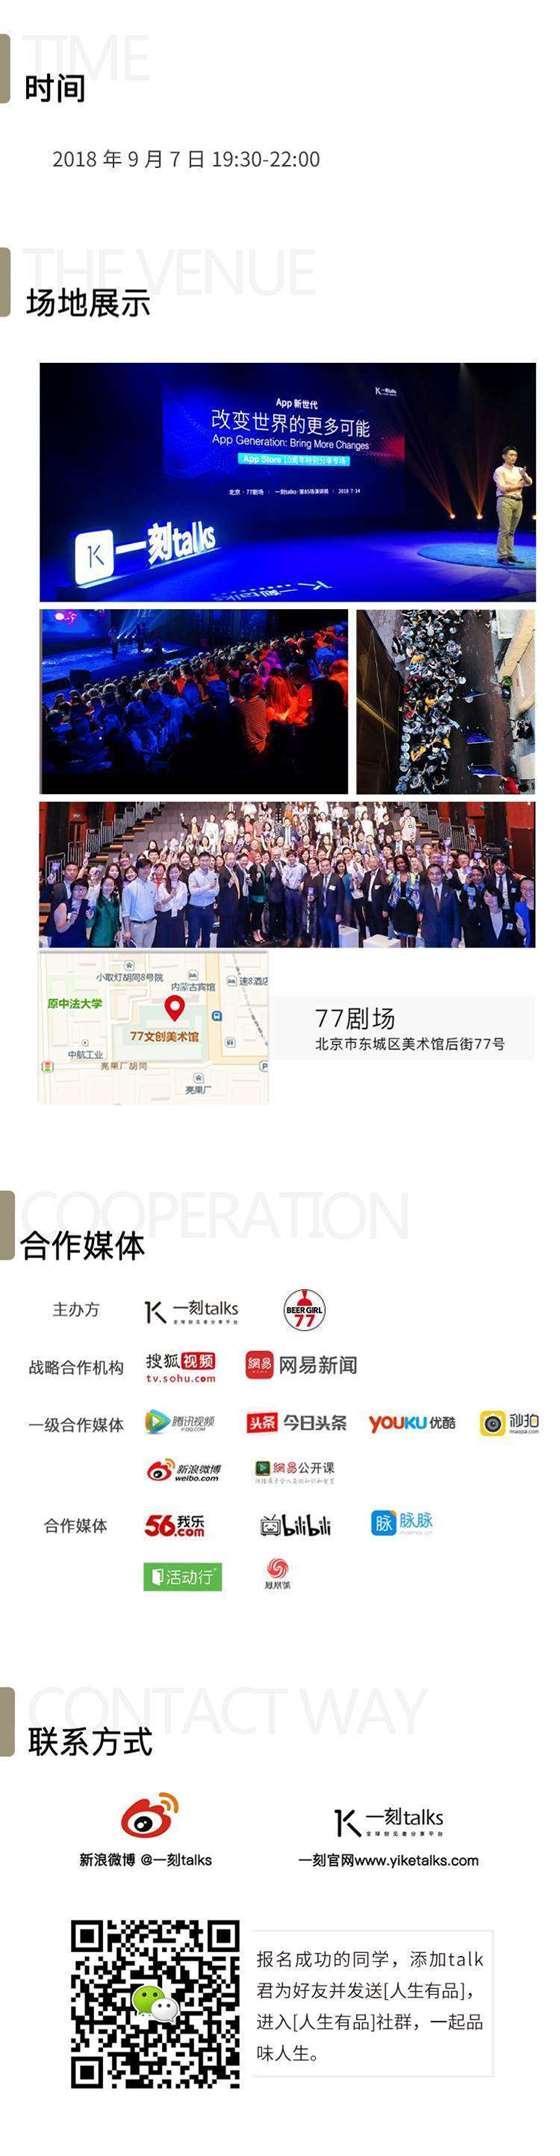 app活动详情页-人生有品活动行_03.jpg